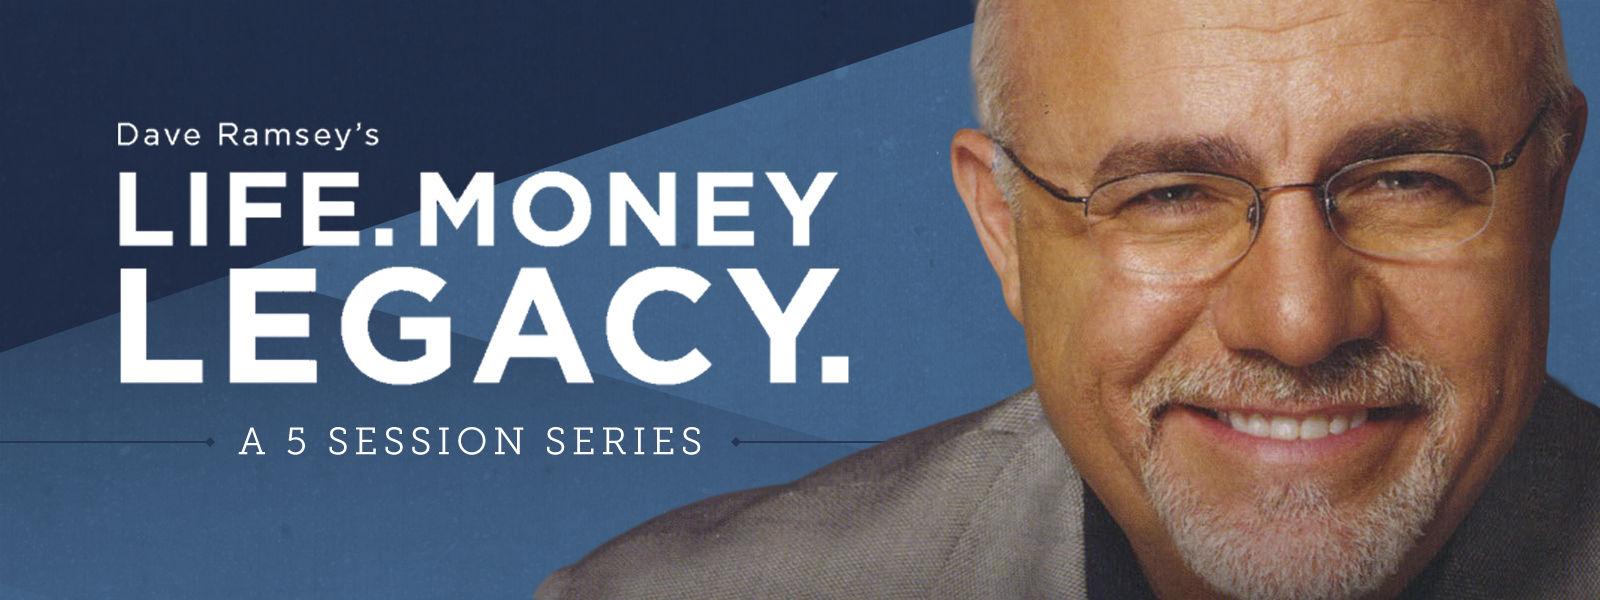 Dave Ramsey's Life. Money. Legacy